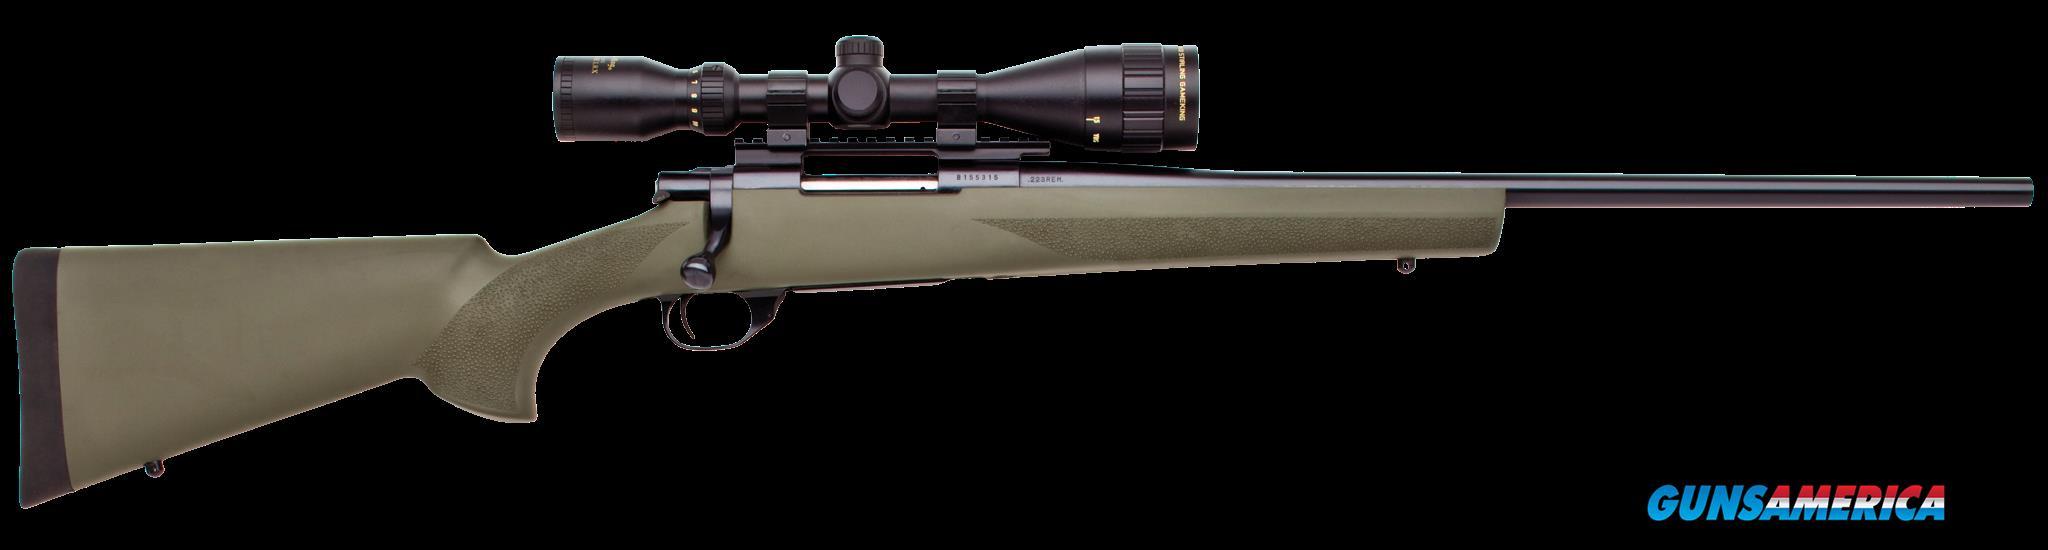 Howa Hogue, Howa Hgk63208+   3006   3-10x44  22 Grn  Guns > Pistols > 1911 Pistol Copies (non-Colt)